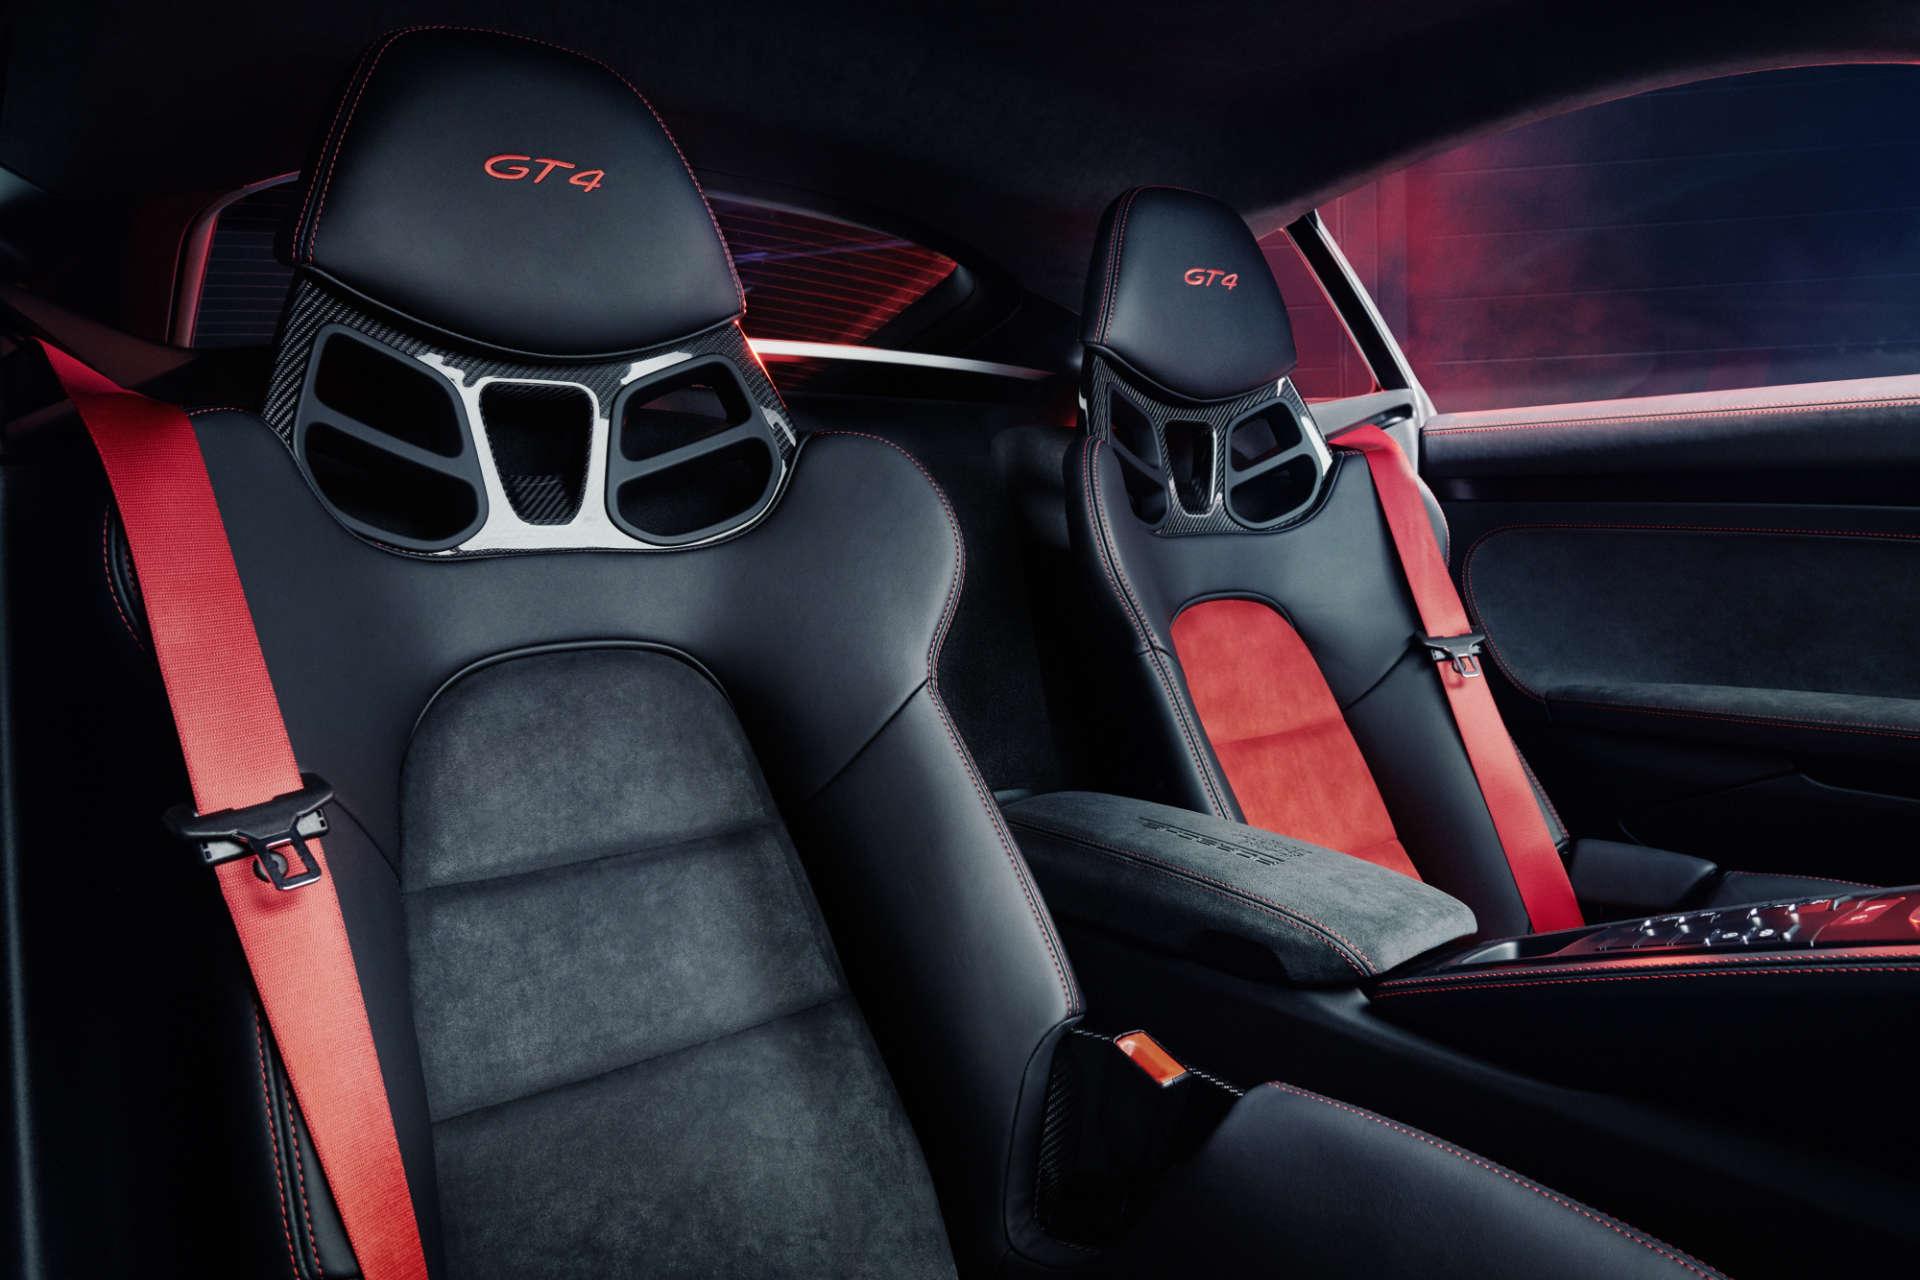 Interior Porsche 718 Cayman GT4 Sports Cup Edition